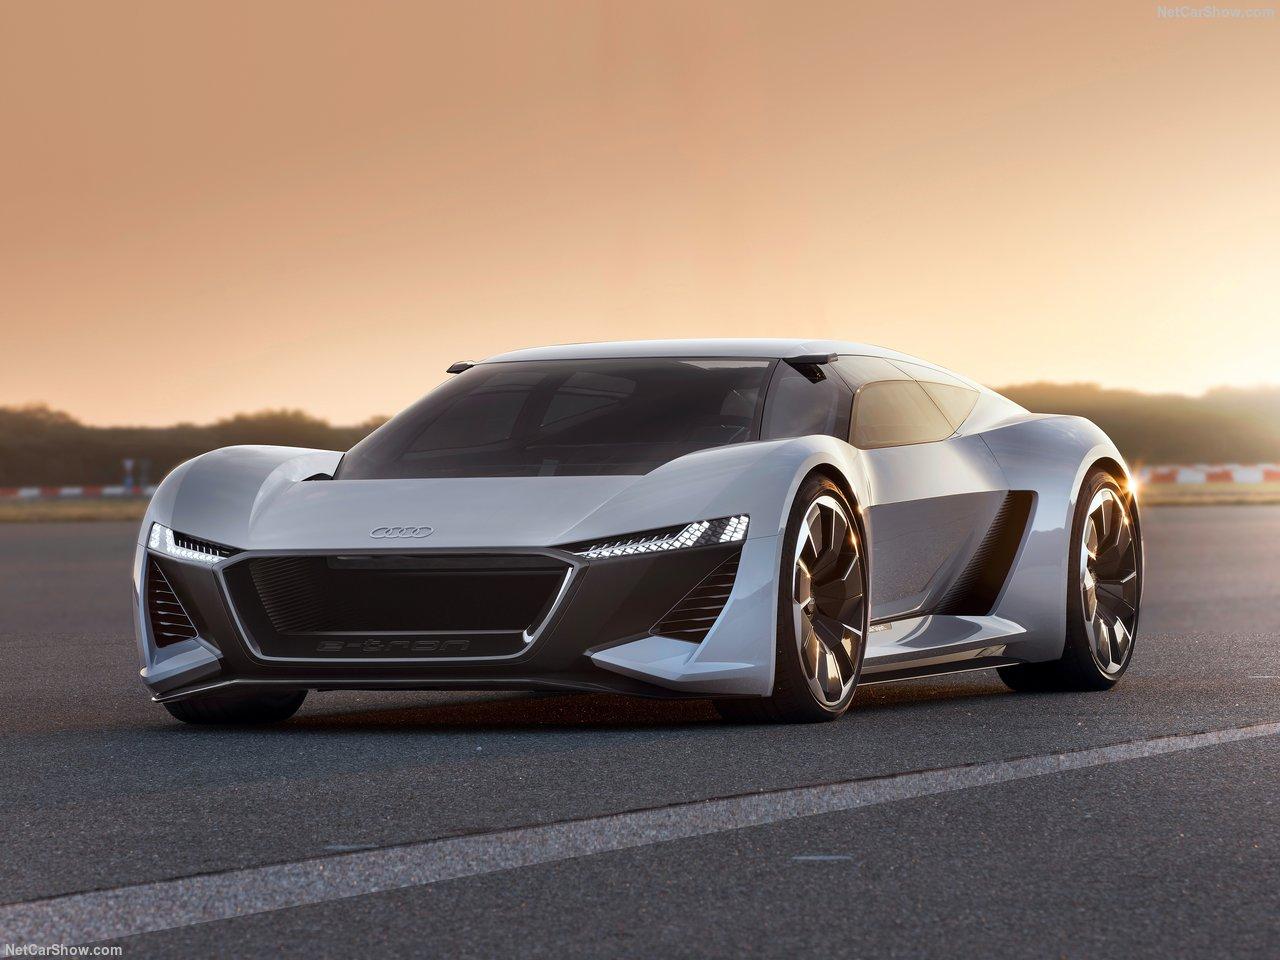 Audi PB18 e-tron concept vehicle